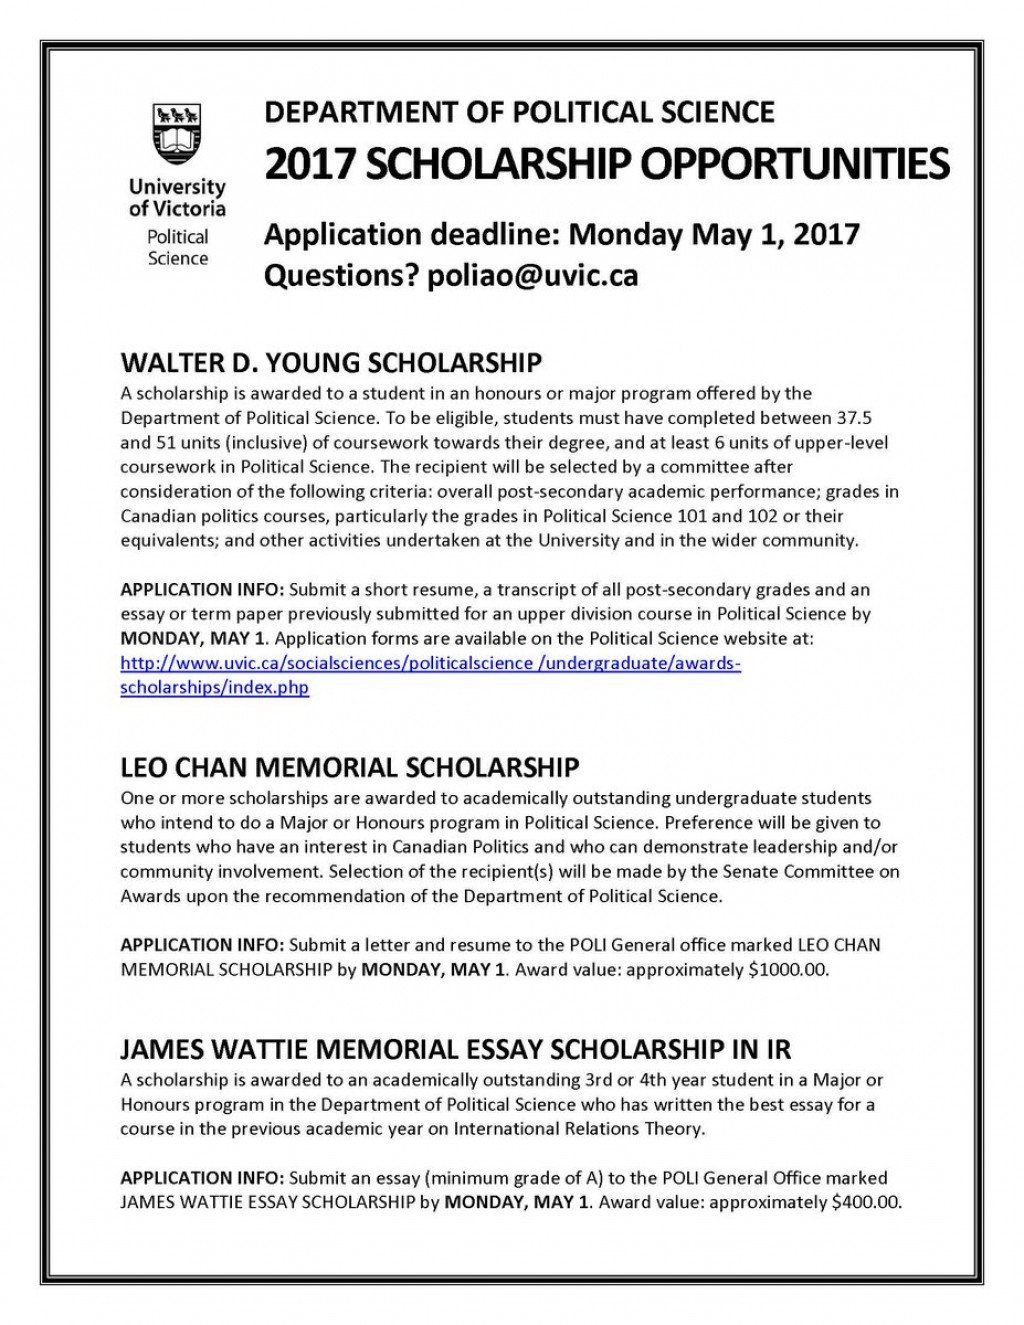 027 Essay Scholarships C943axuuiaasrbu Wonderful 2017 No College Canada Large